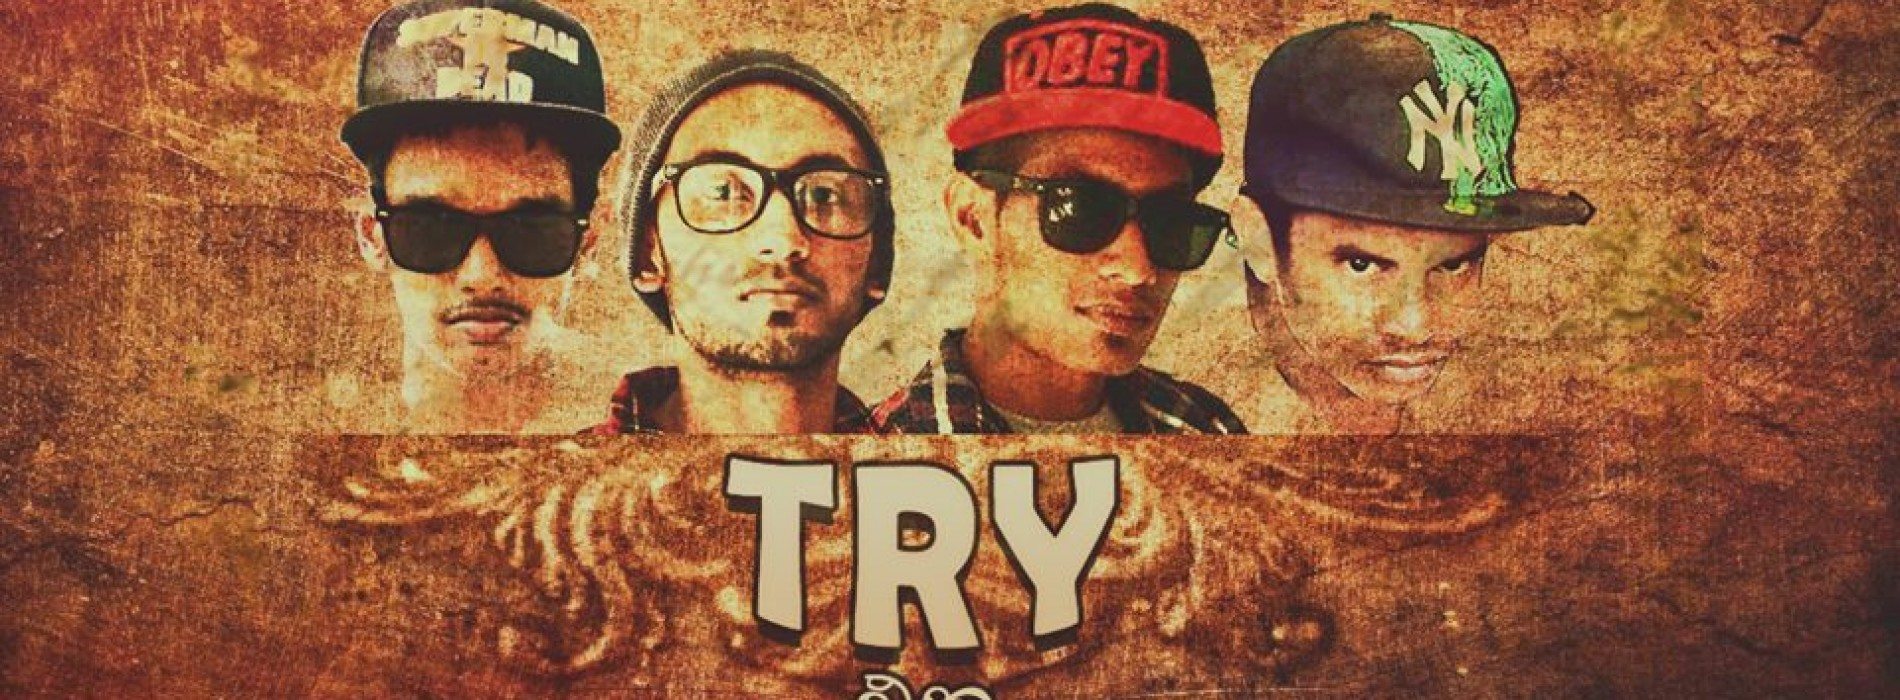 "Durty Jay ft Chiraj & Smoke: ""Try එක"" [Mixtape]"